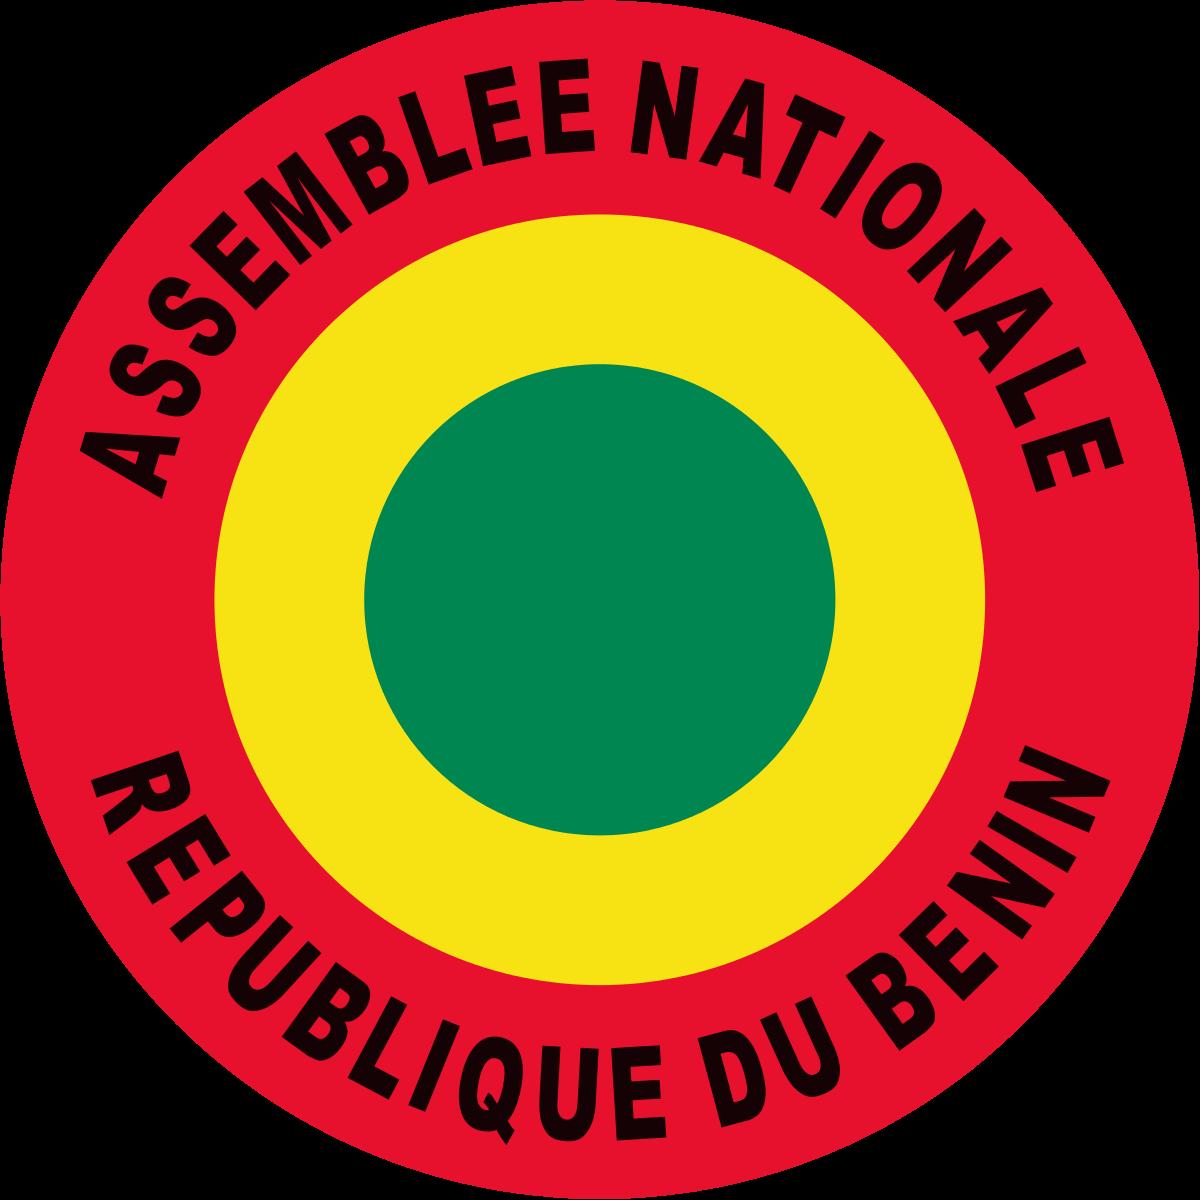 Assemblée nationale (Bénin) — Wikipédia.